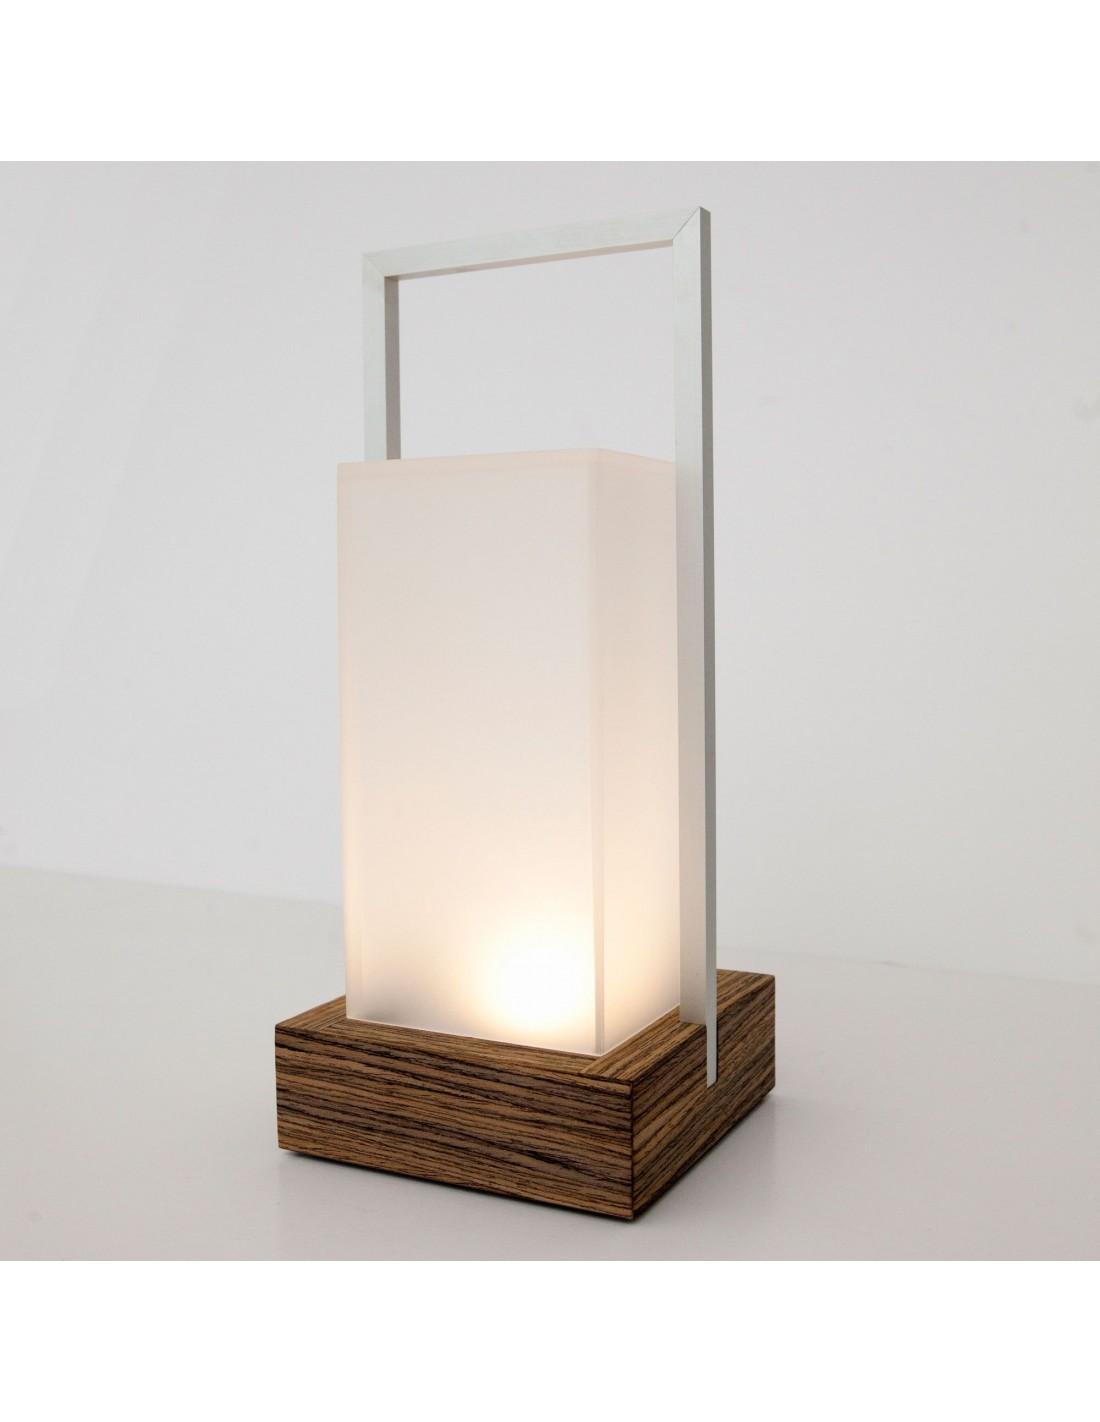 Lampe de table sans fil outdoor Codega finition bois Viabizzuno - Valente Design